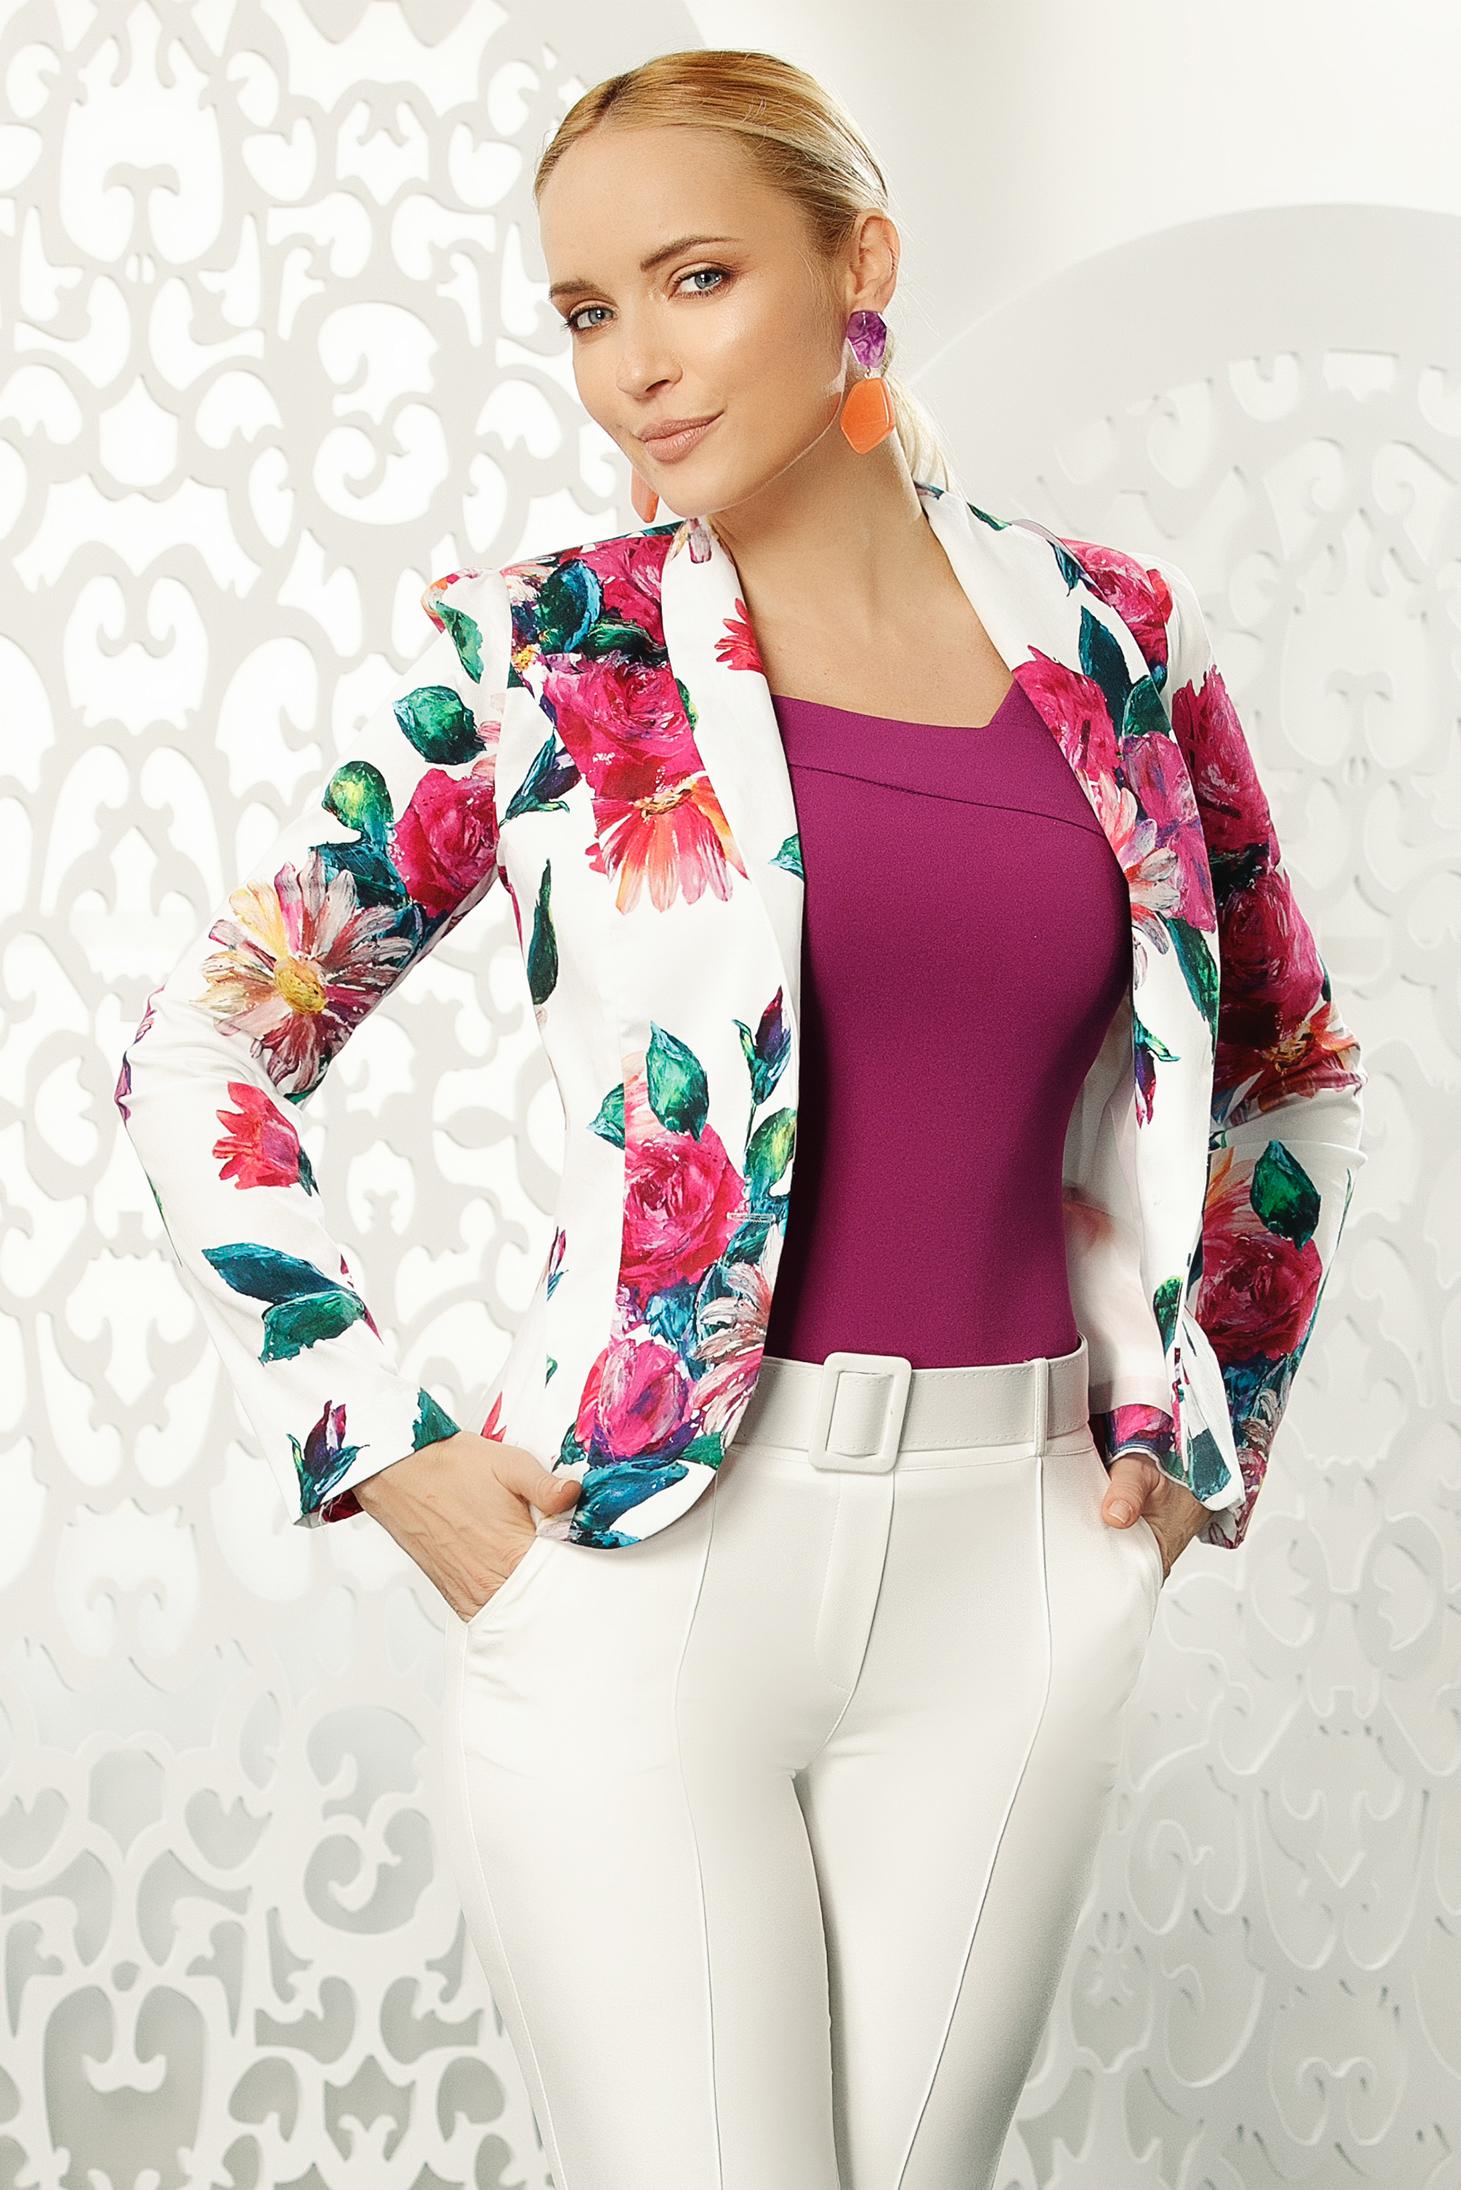 Sacou Fofy roz office tip blazer cambrat cu maneca lunga din bumbac usor elastic cu imprimeu floral